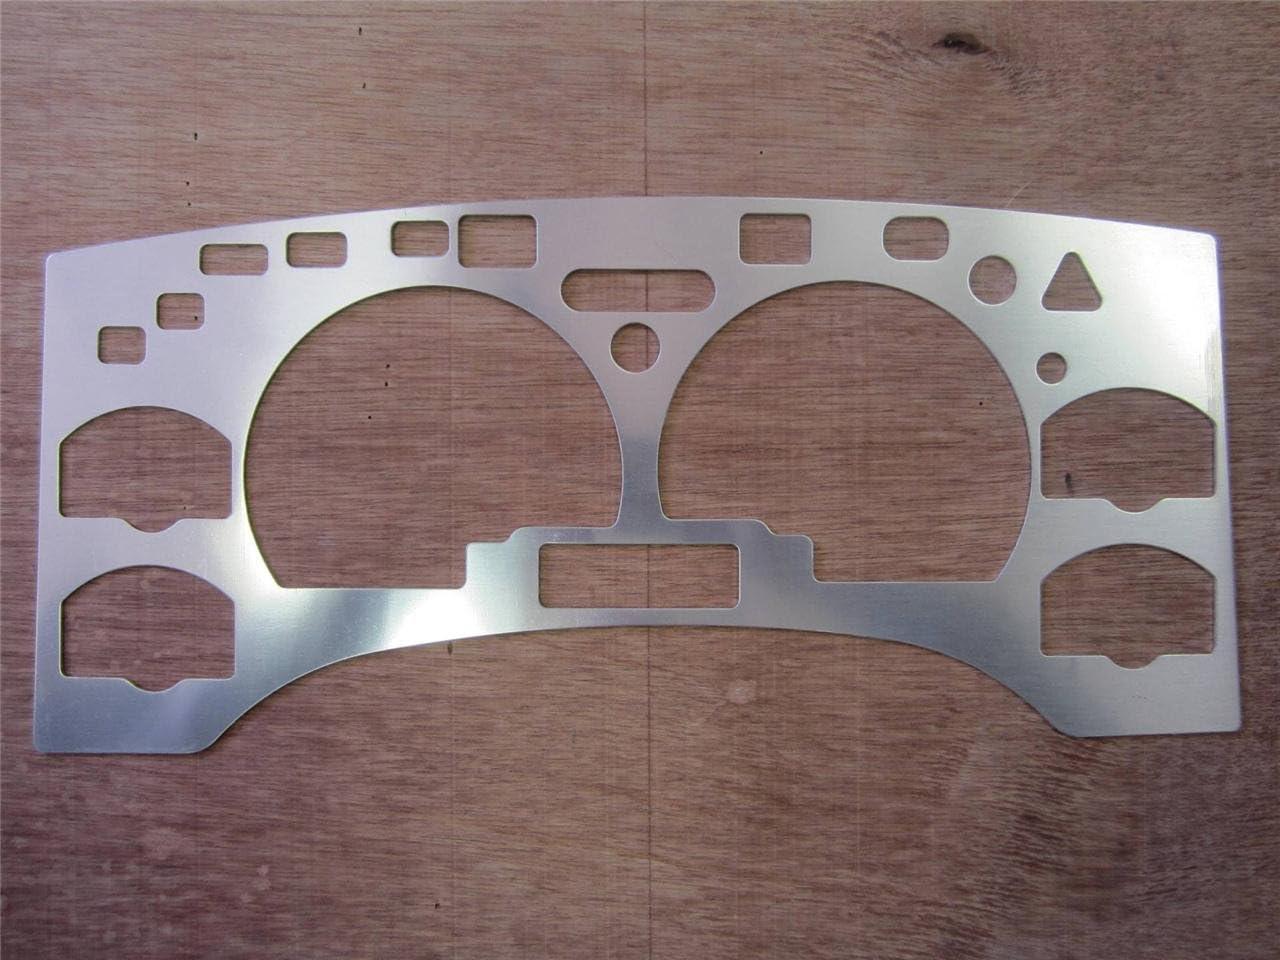 APC 1995 1996 1997 Chevy S10 Blazer w/Tachometer RPM Gauge Bezel Cluster Dash Trim - Aluminum